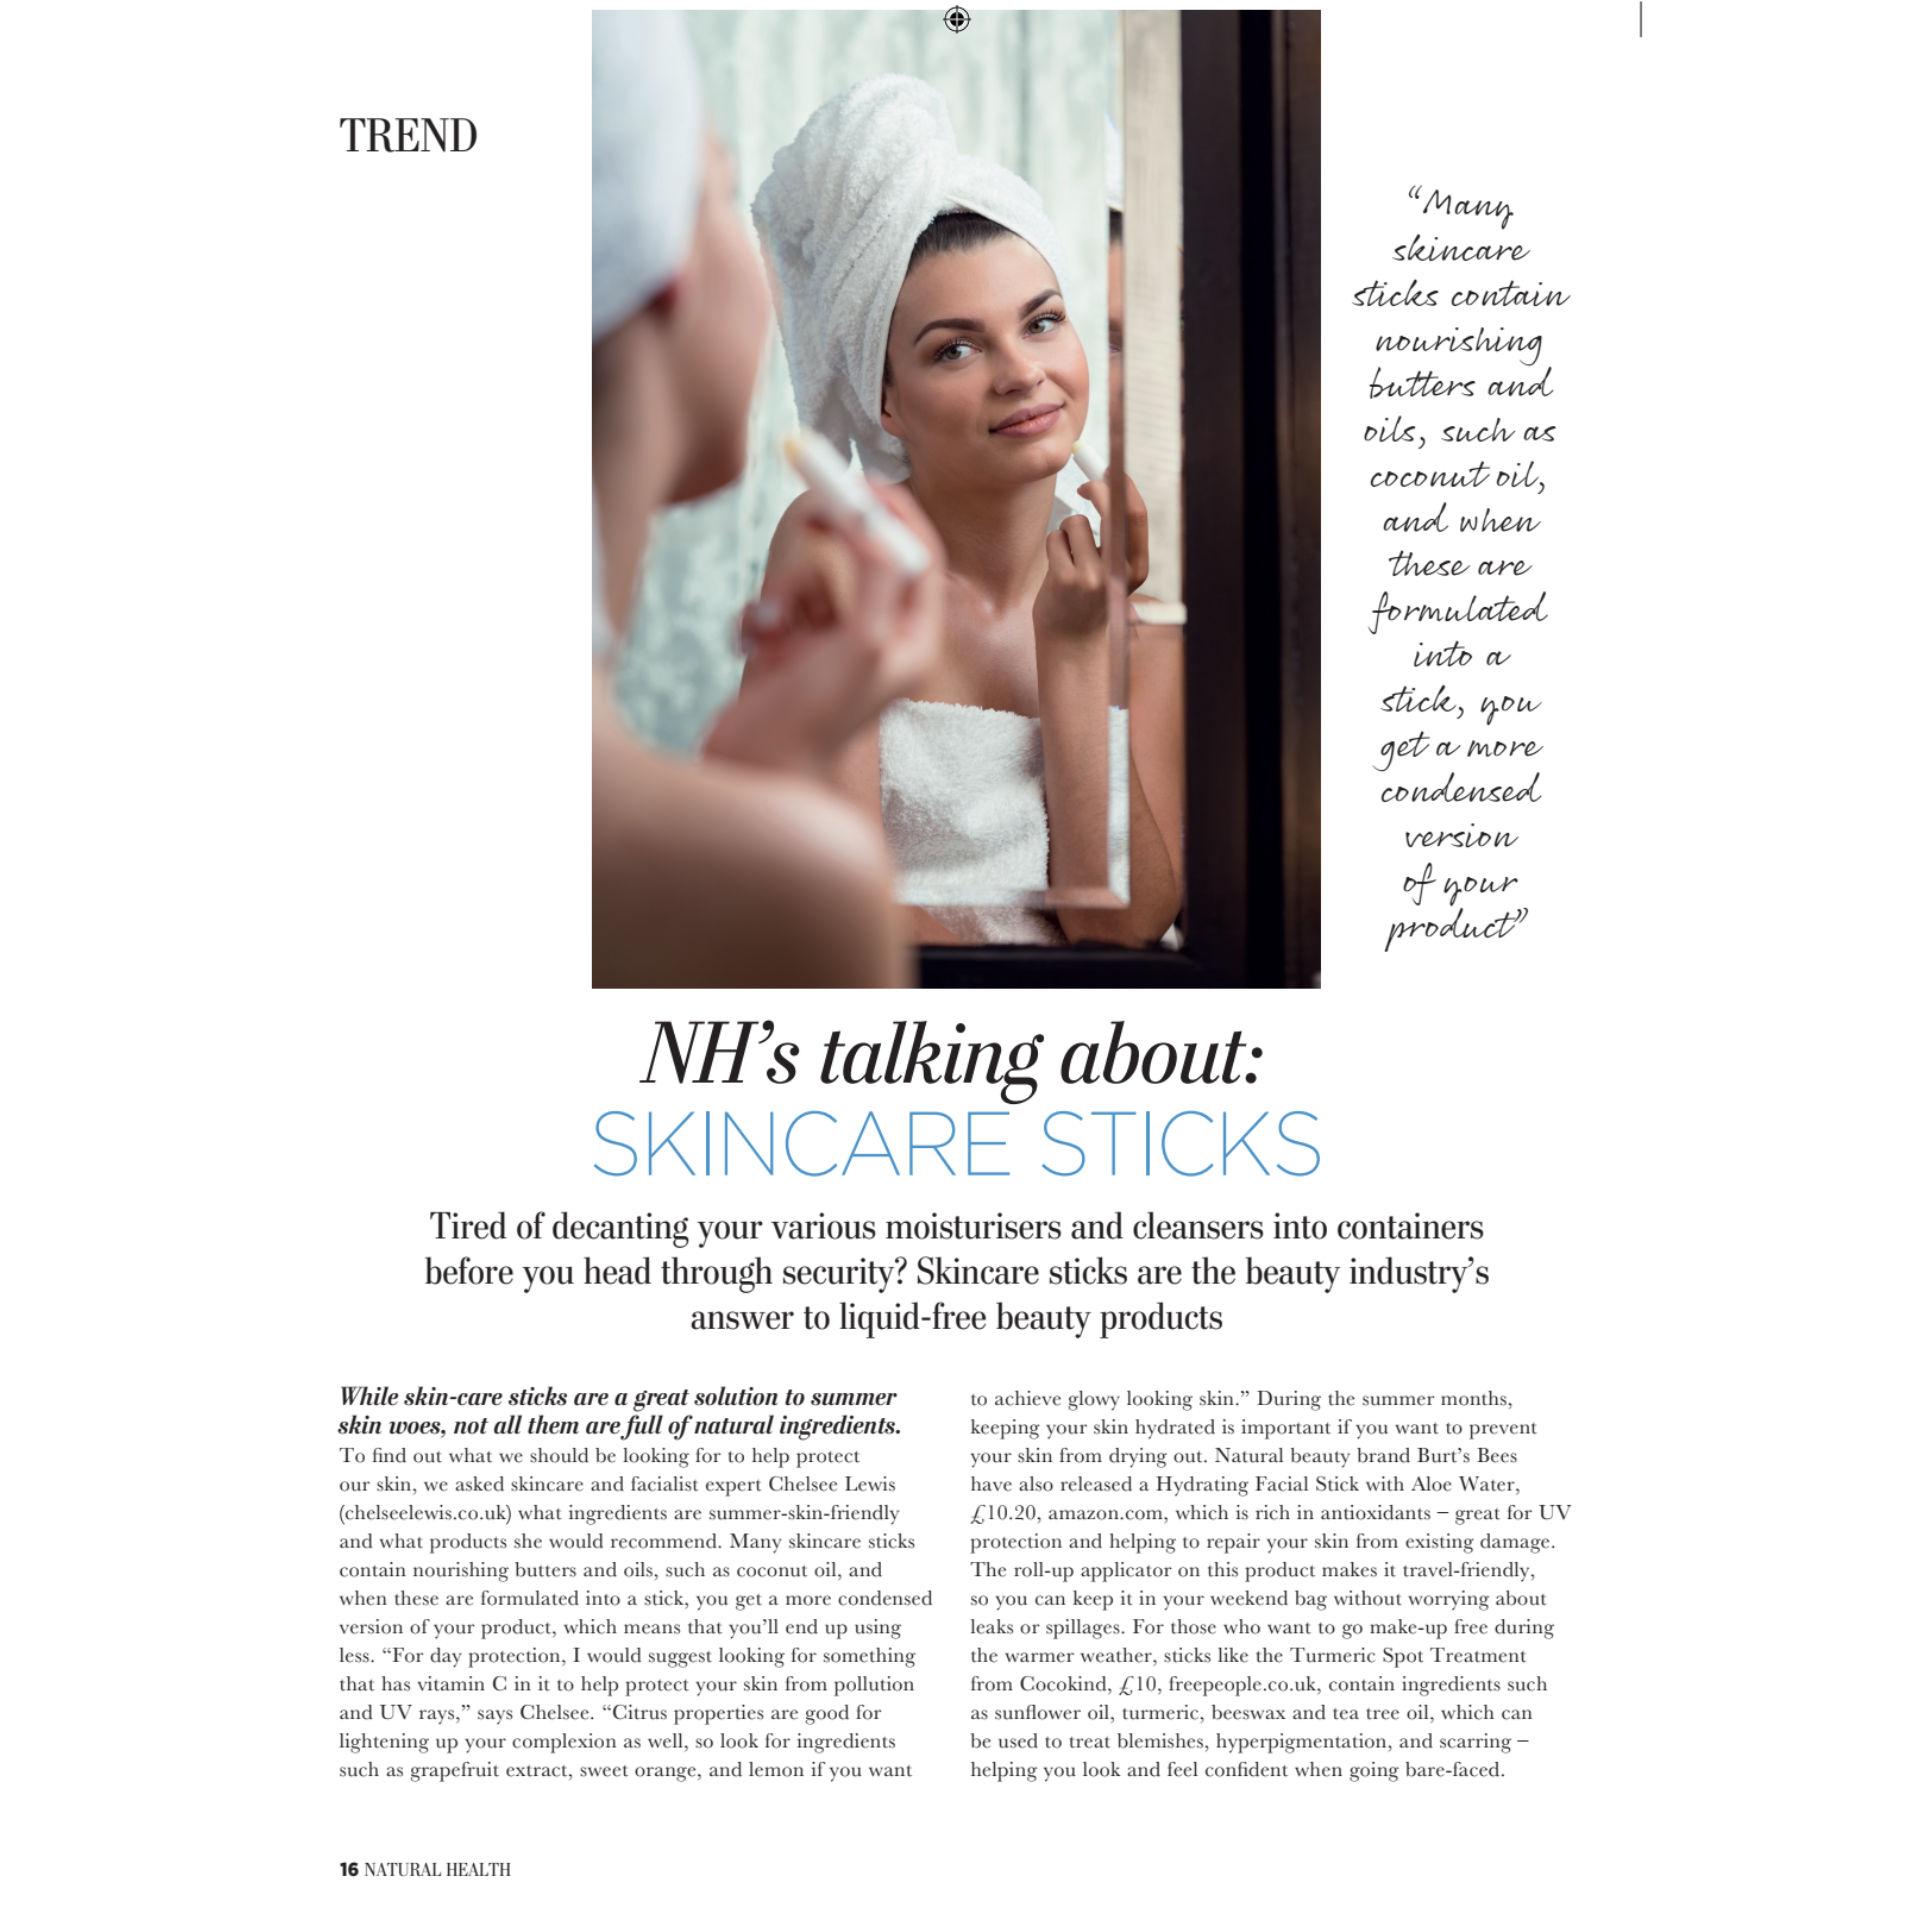 Natural Health Magazine article